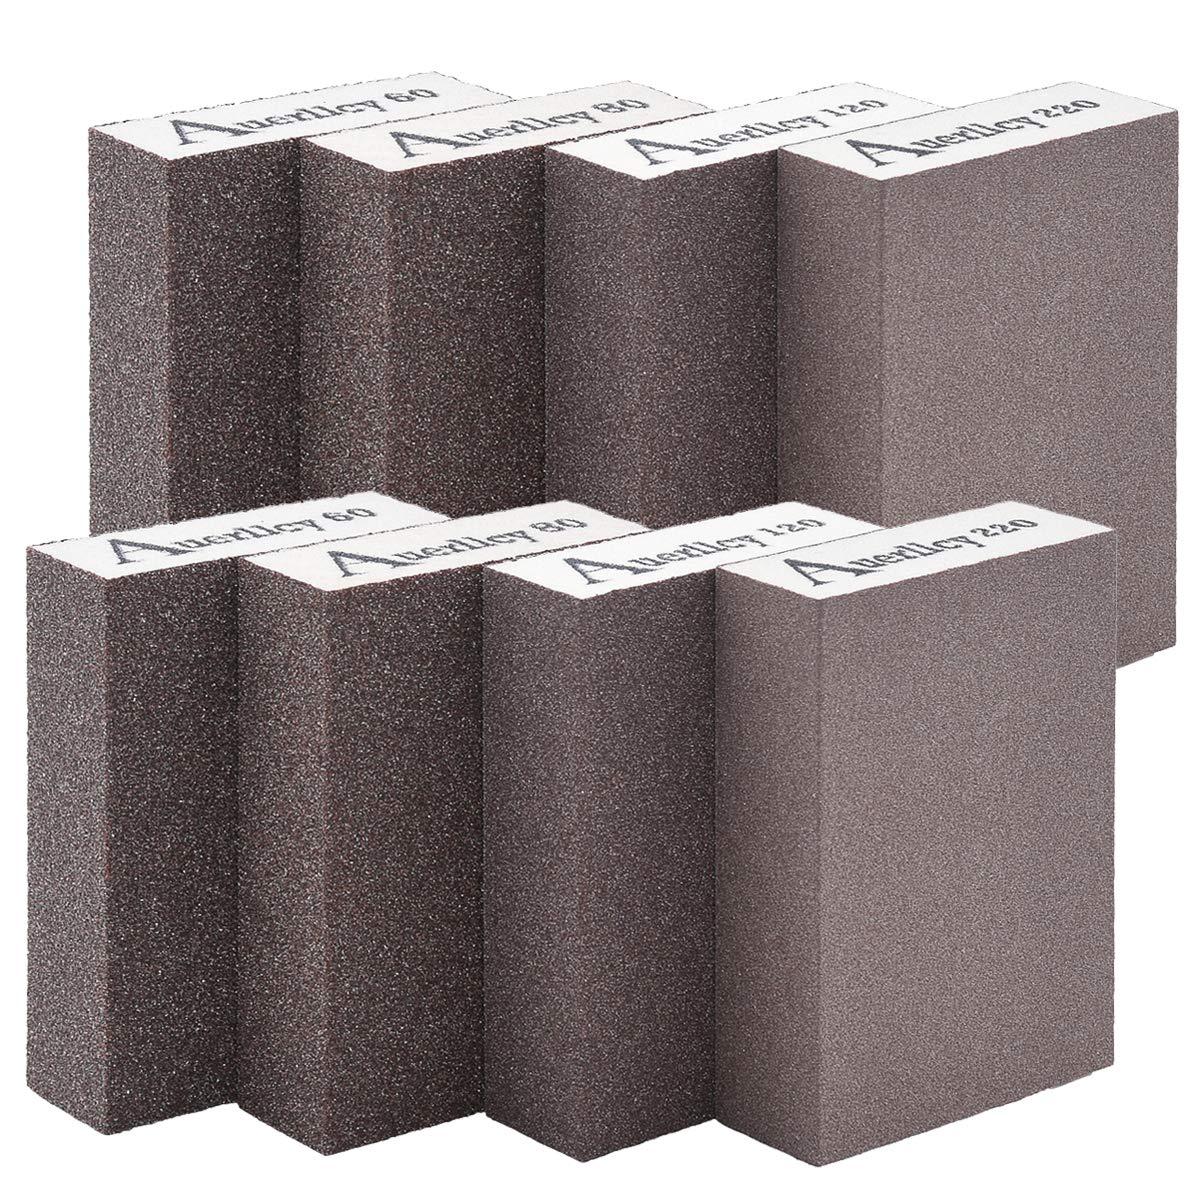 Sanding Sponge,Coarse/Medium/Fine/Superfine 8PCS 4 Different Specifications Sanding Blocks Assortment,Washable and Reusable. (8 PCS) by Auerllcy